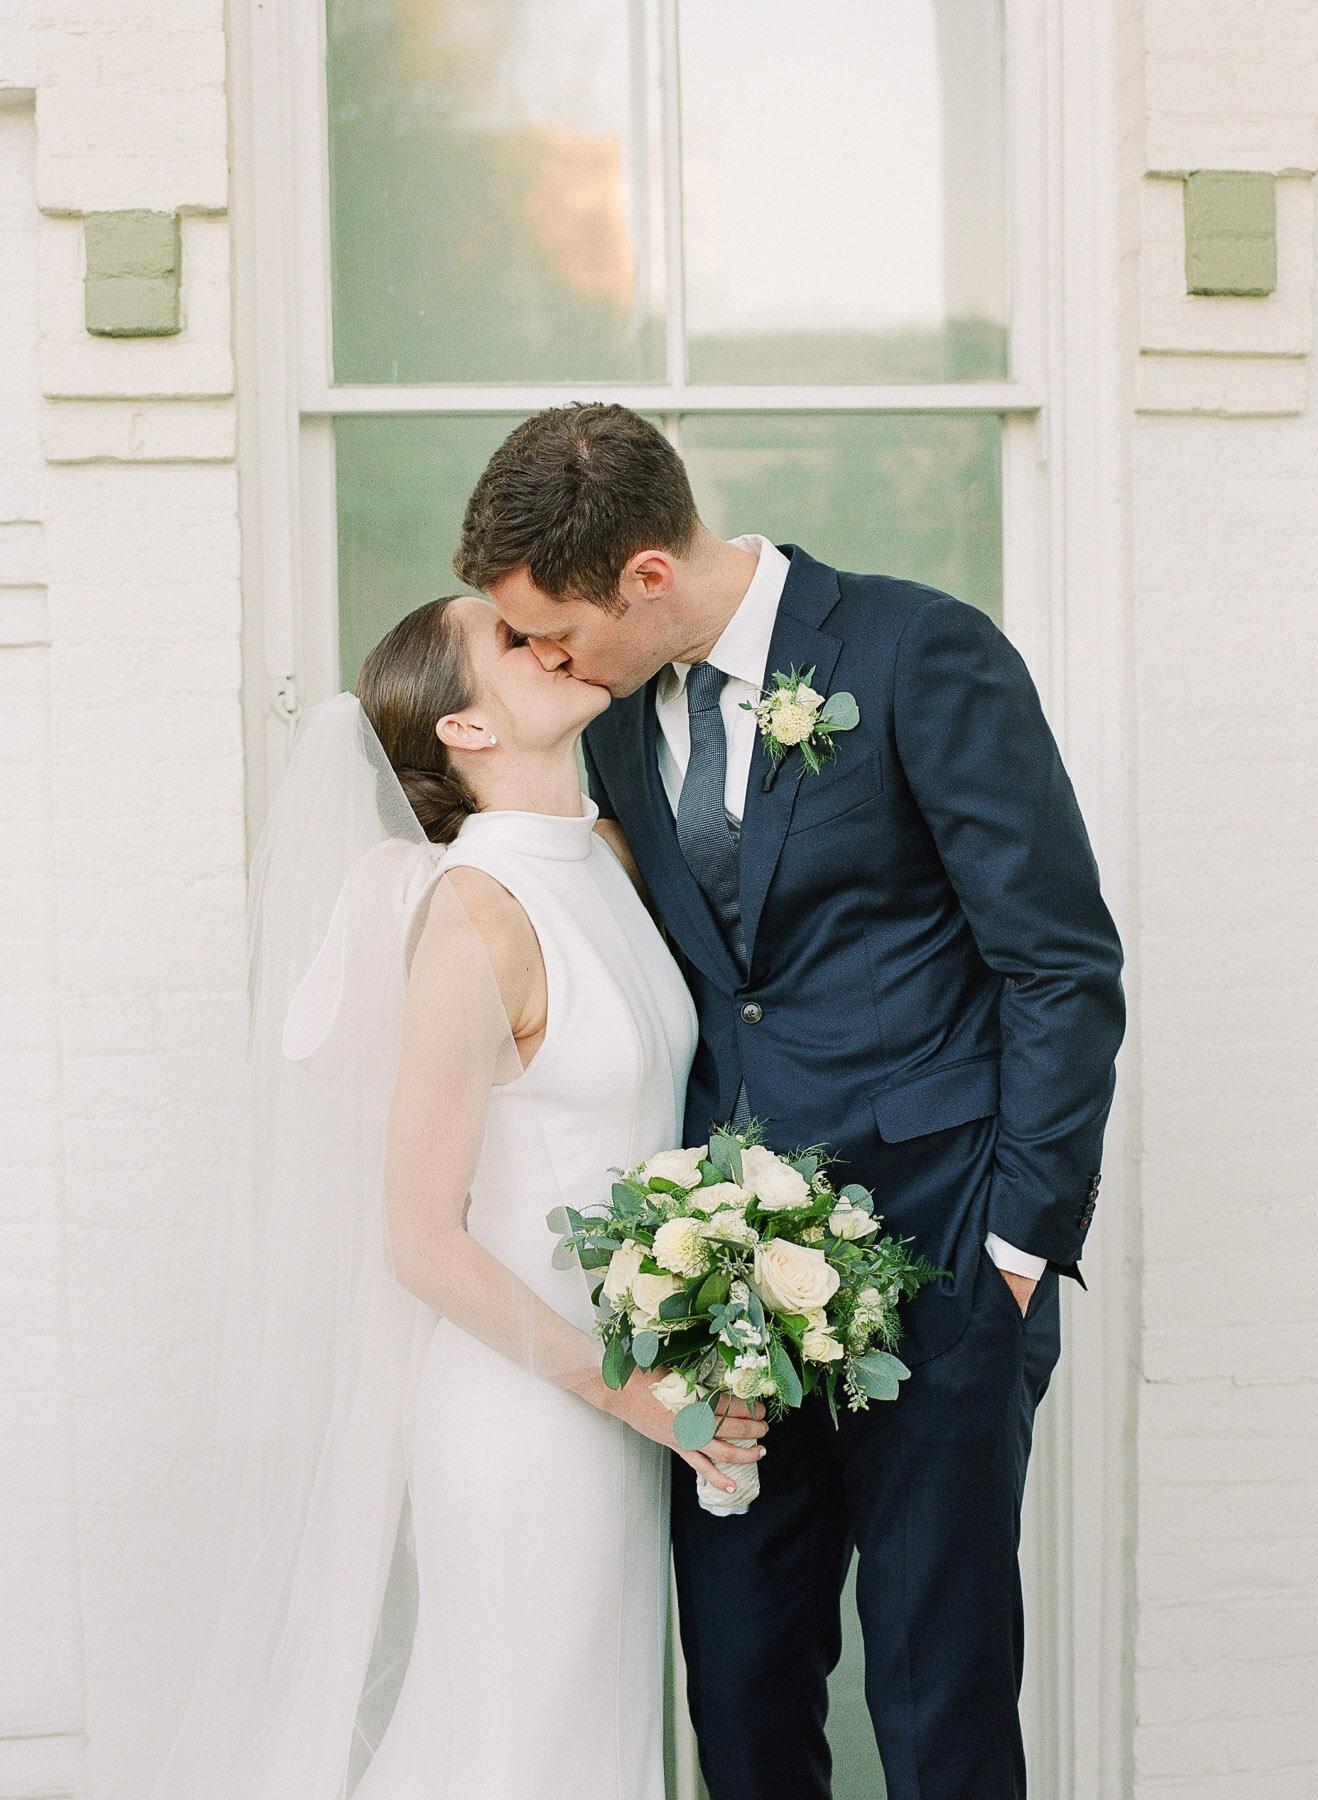 Adelphi Saratoga Wedding by Michelle Lange Photography-35.jpg